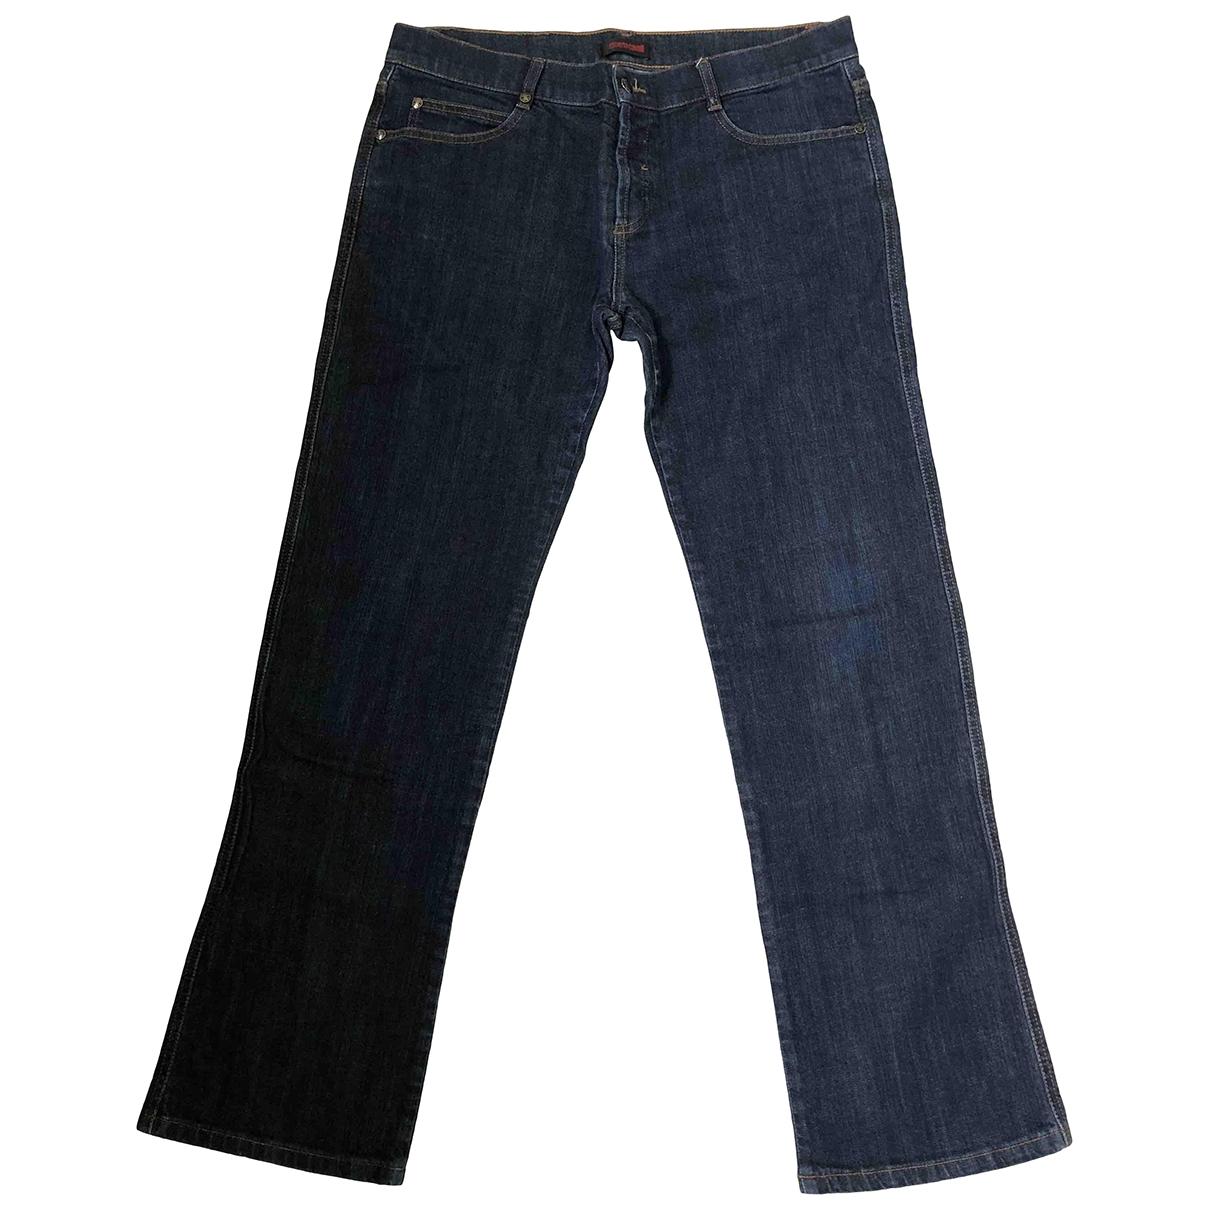 Roberto Cavalli \N Blue Cotton - elasthane Jeans for Men 34 US